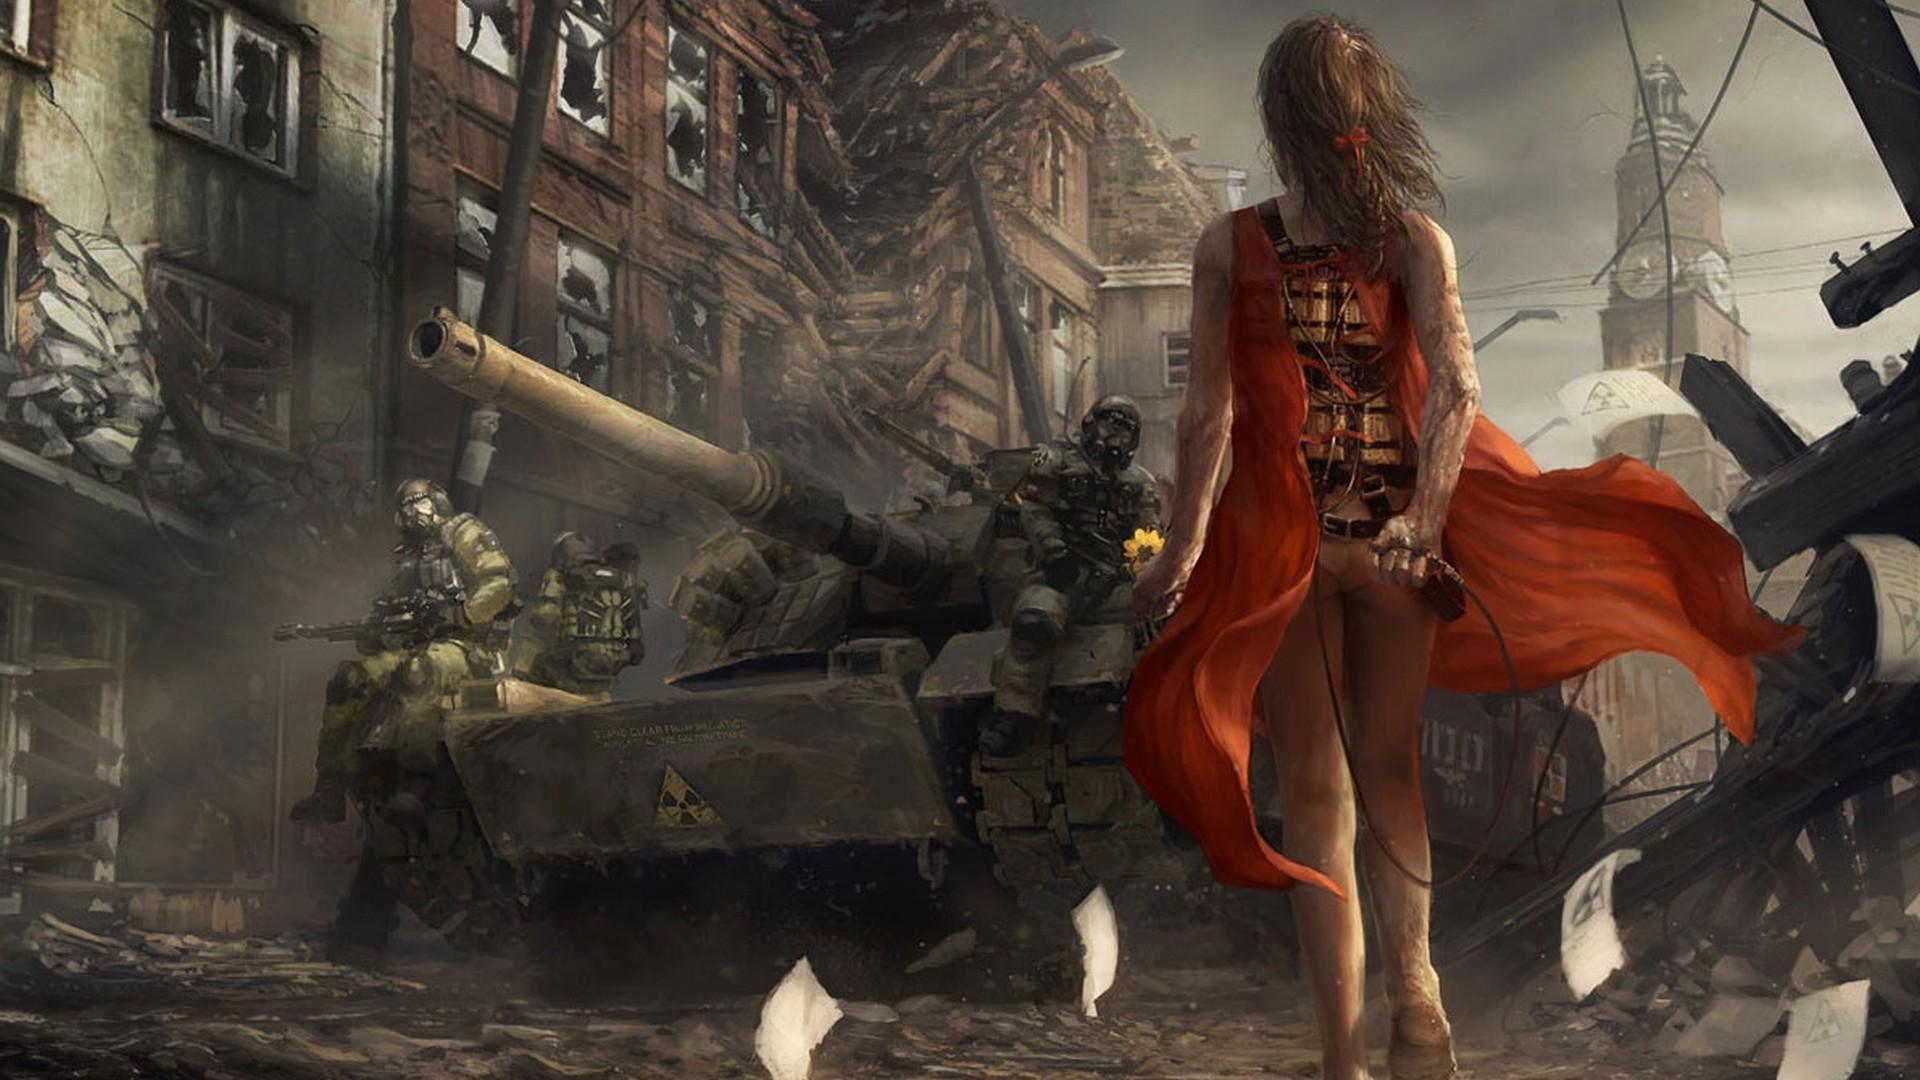 Free war wallpaper background